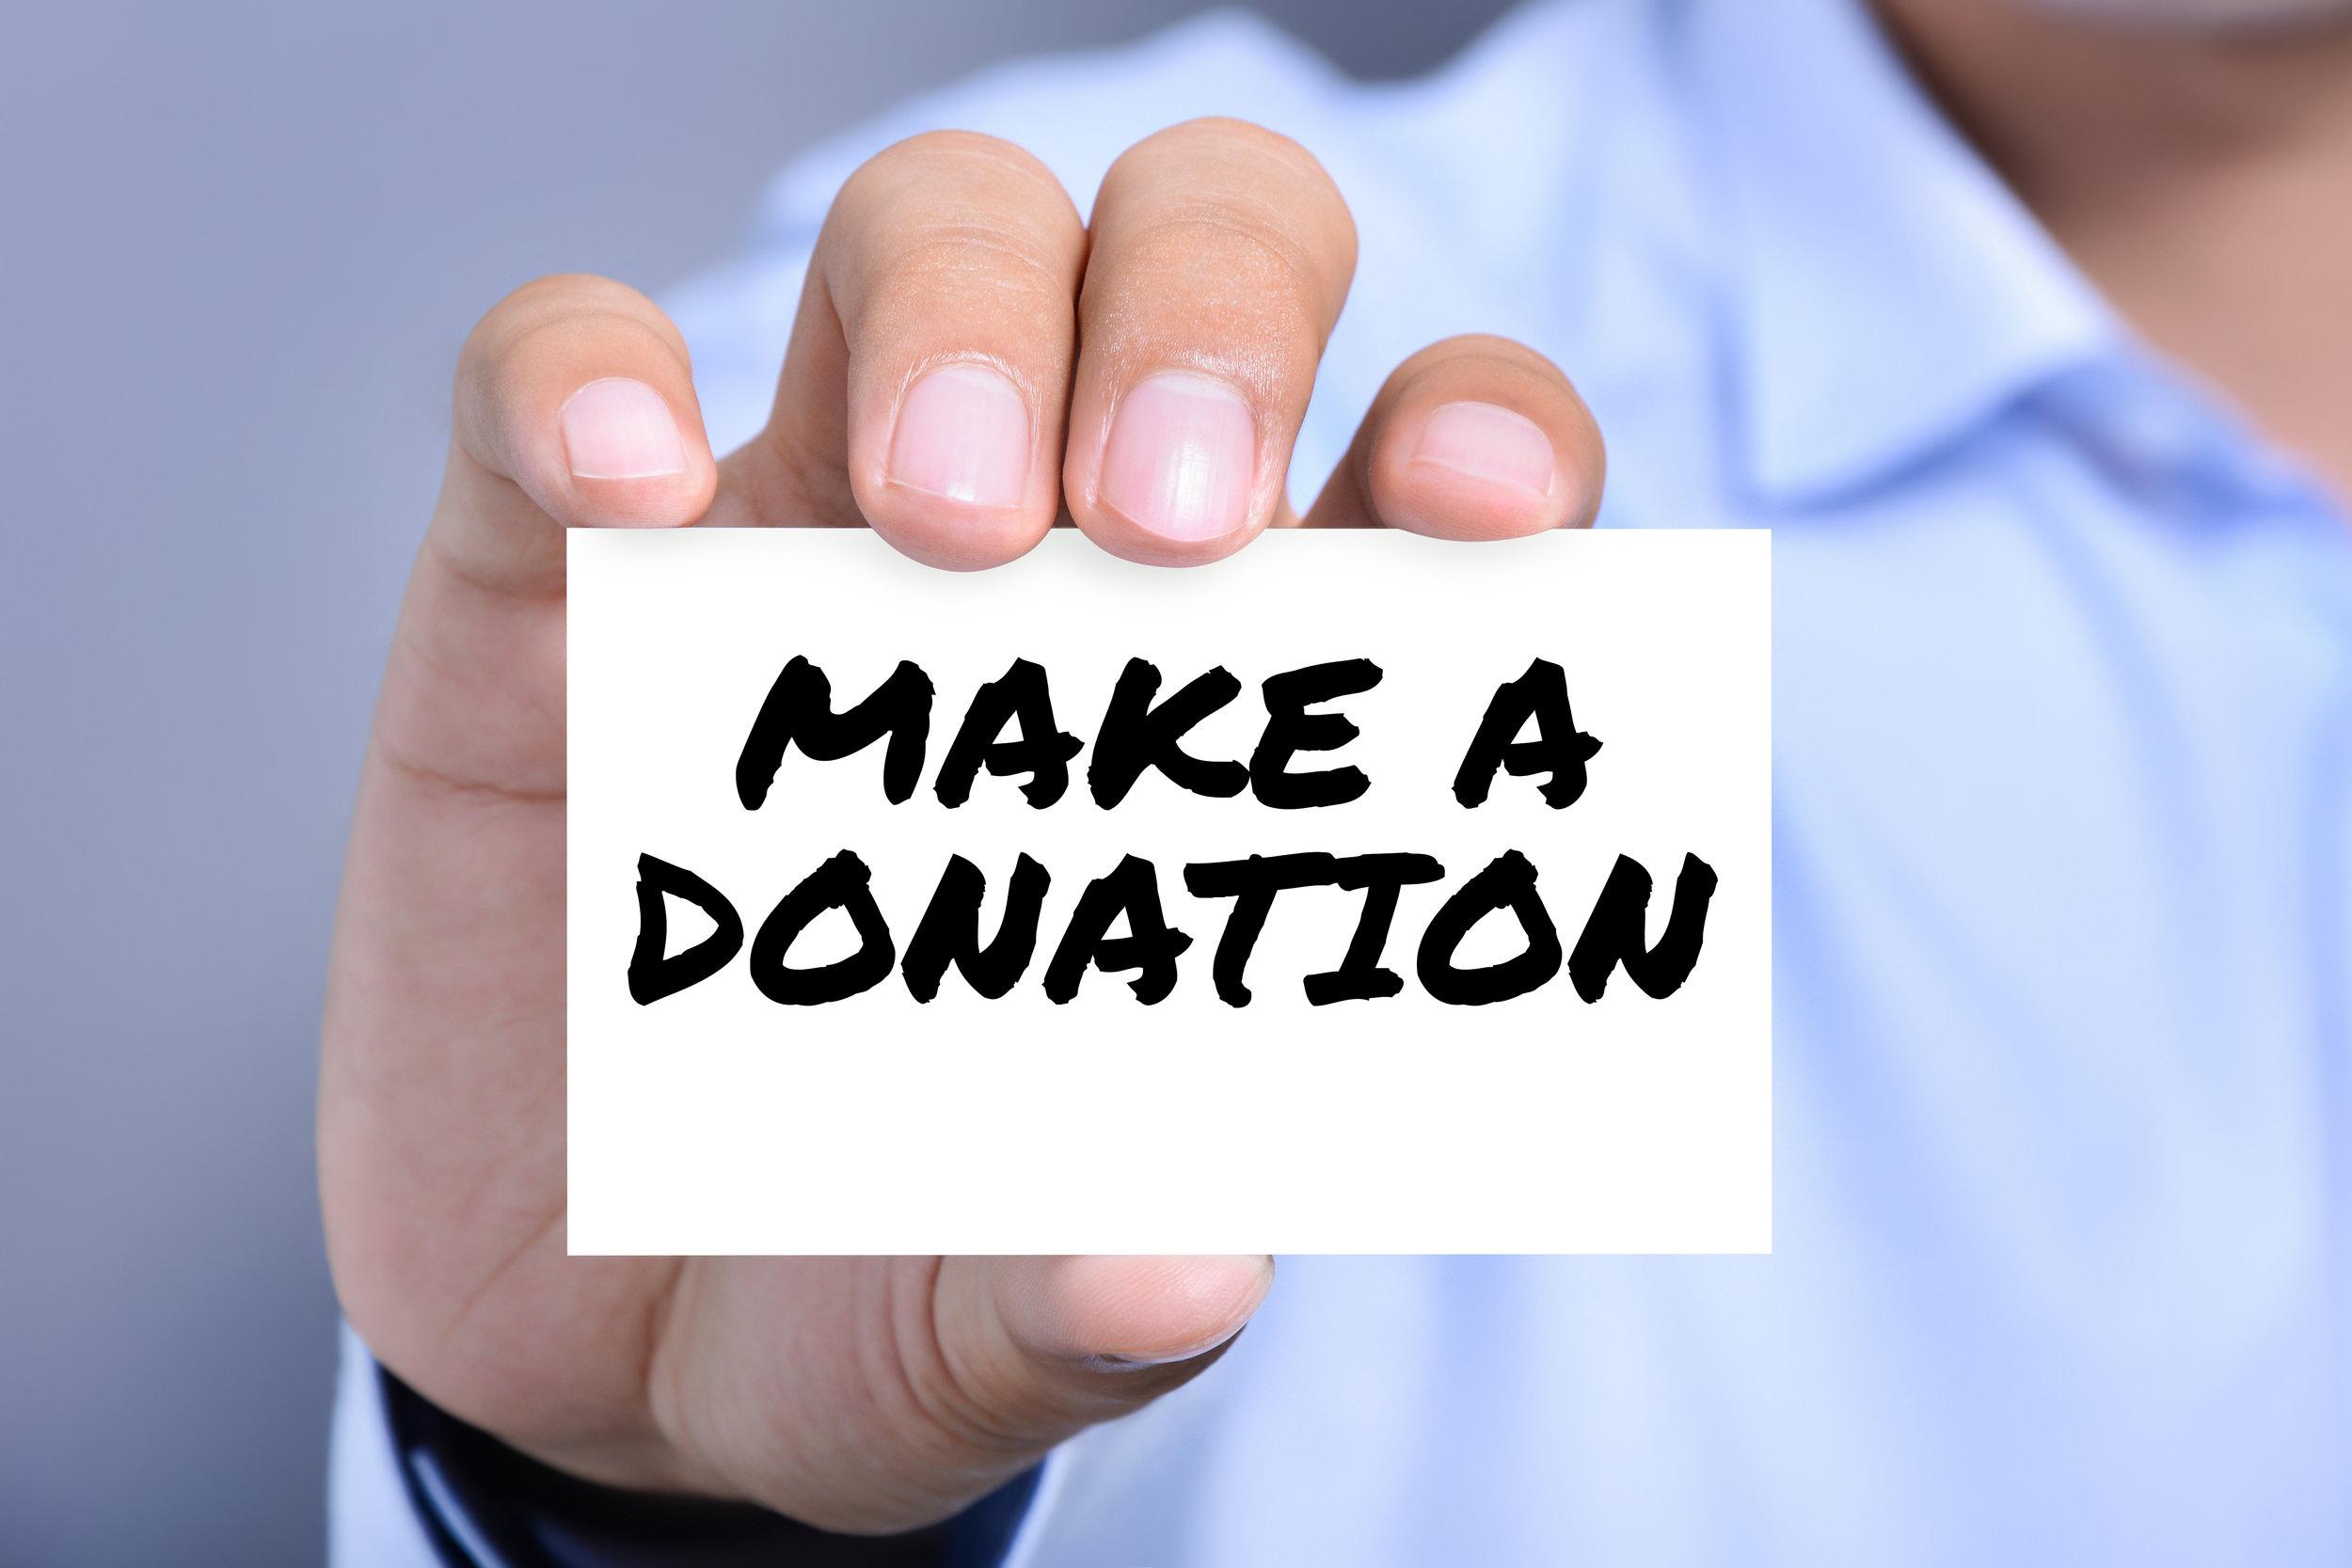 donation image.jpg